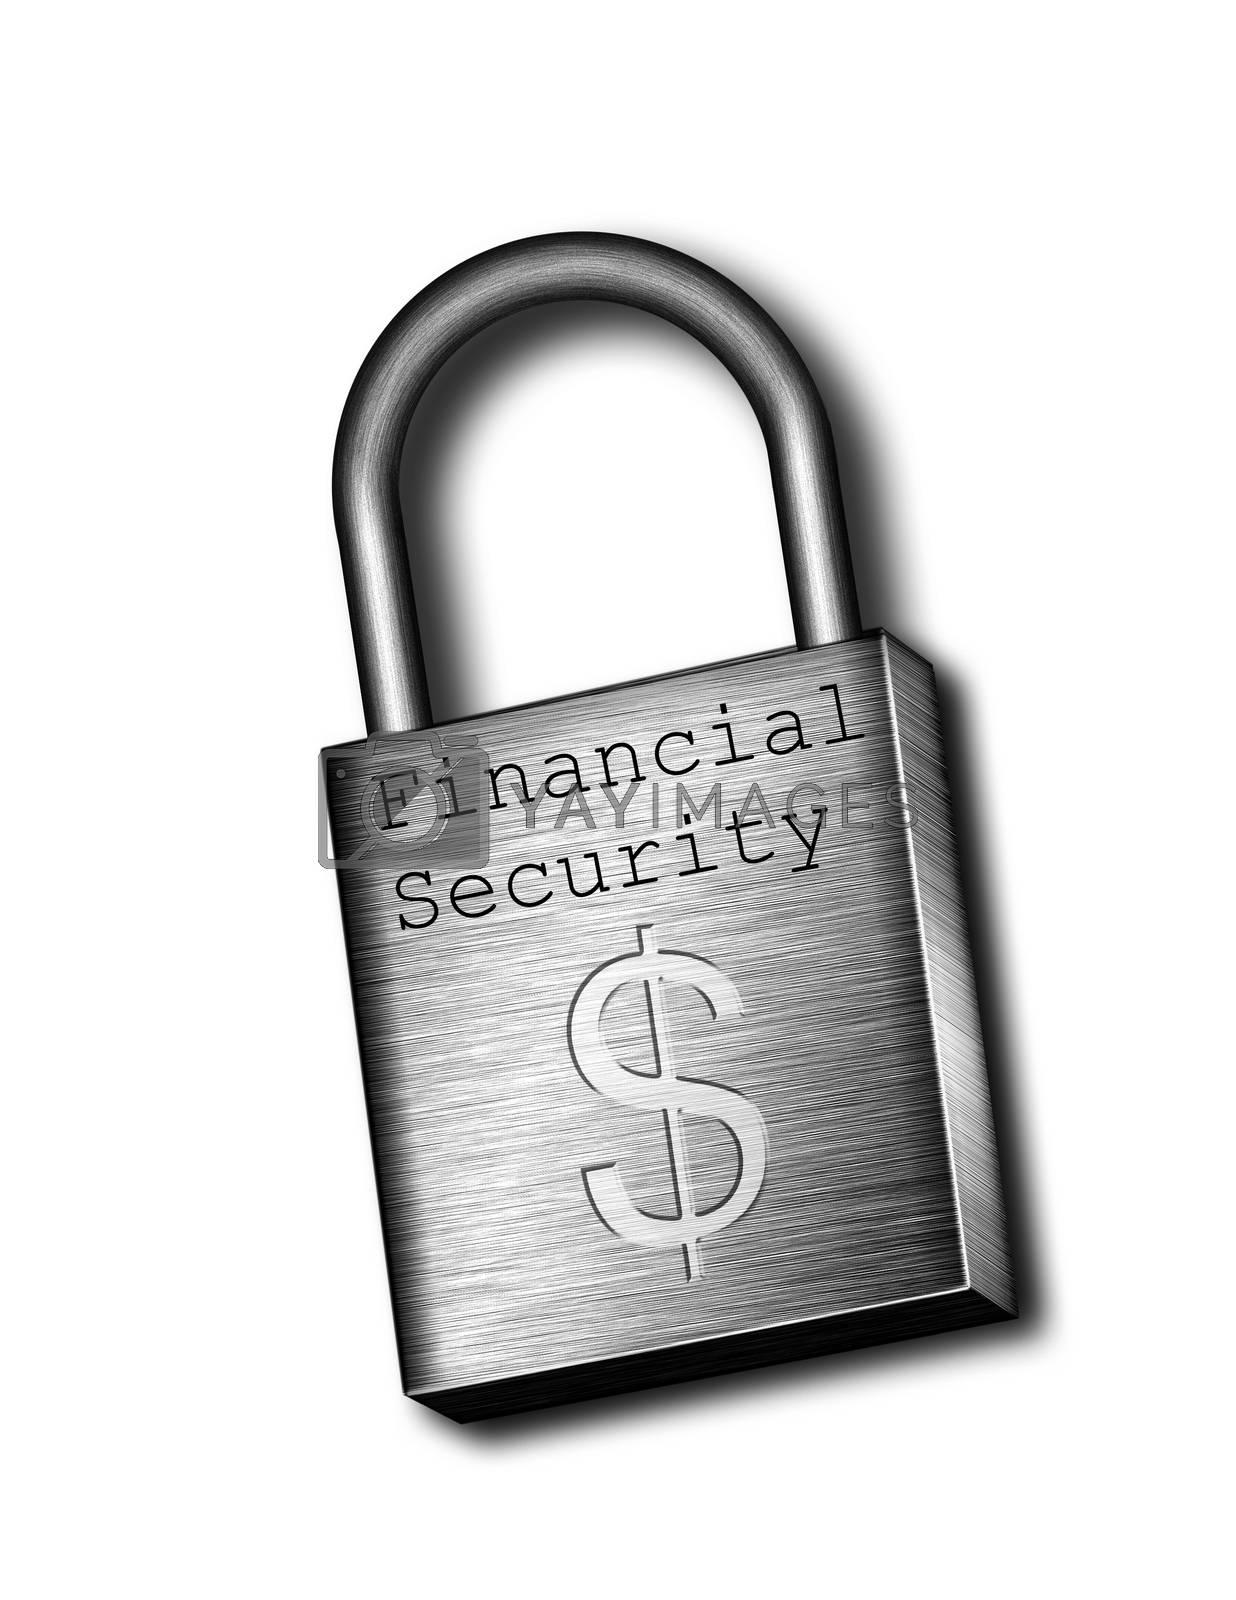 Closed padlock symbolizes financial security. US Dollar sign.